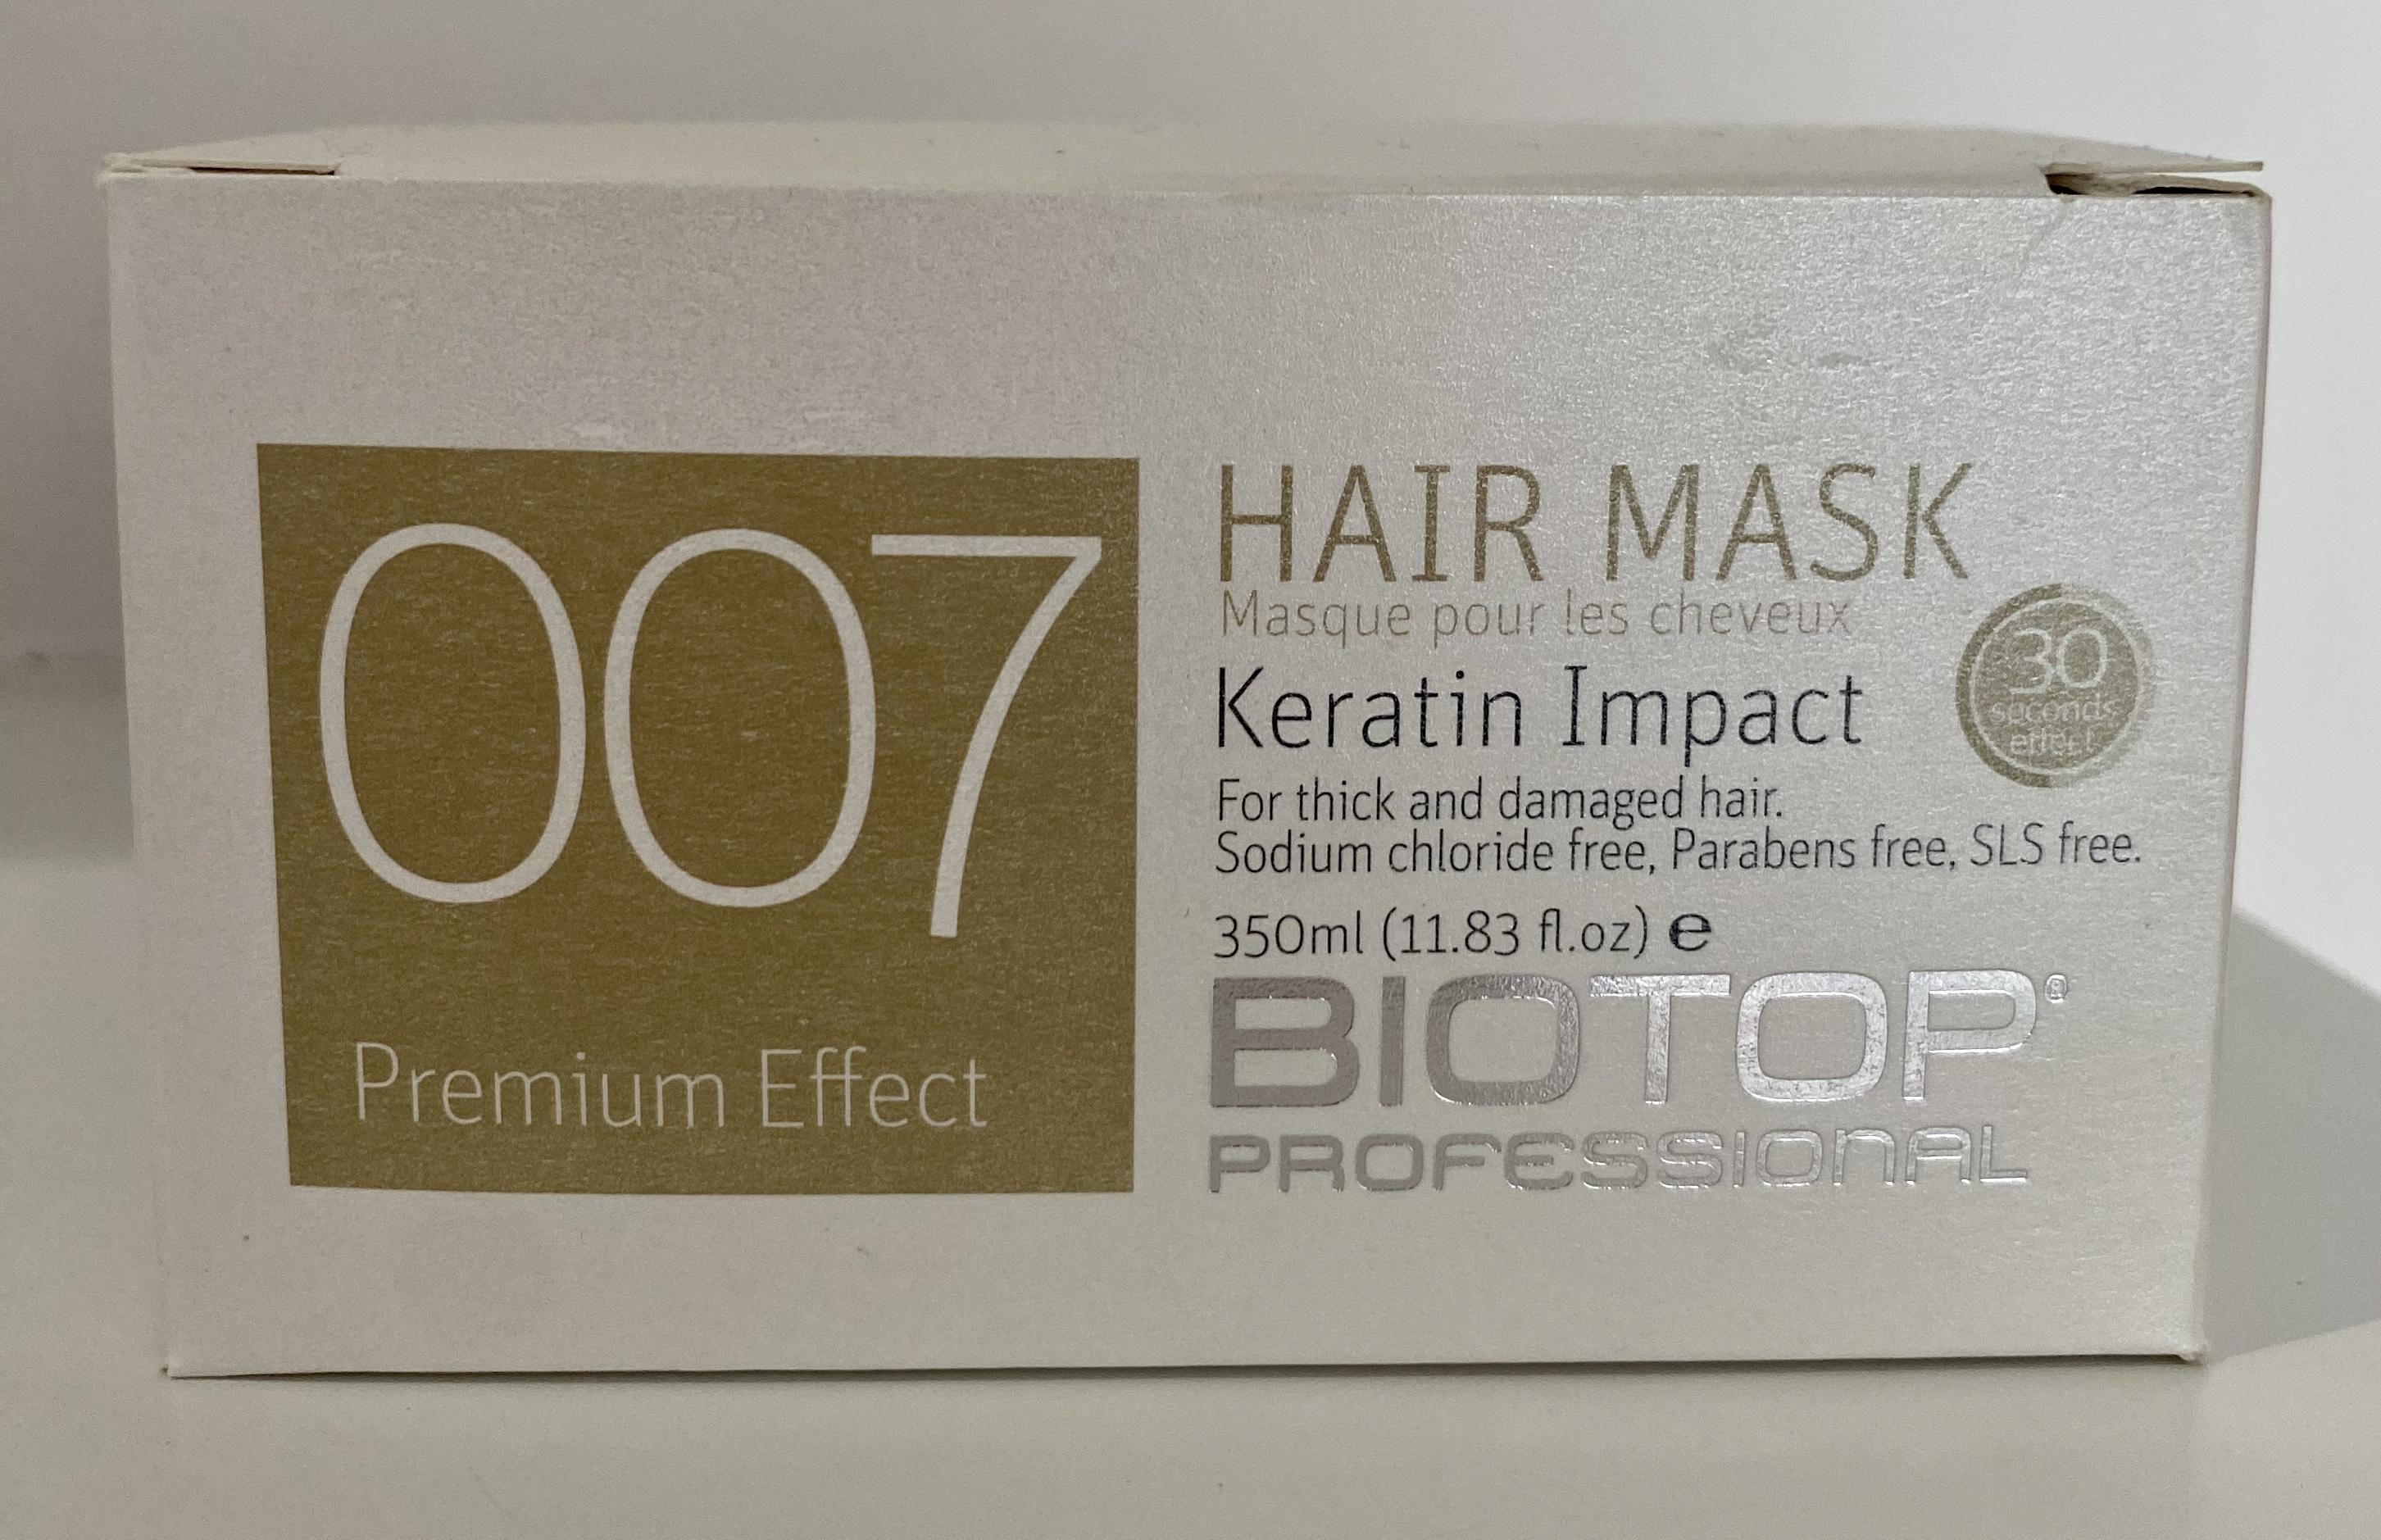 007 Keratin Hair Mask